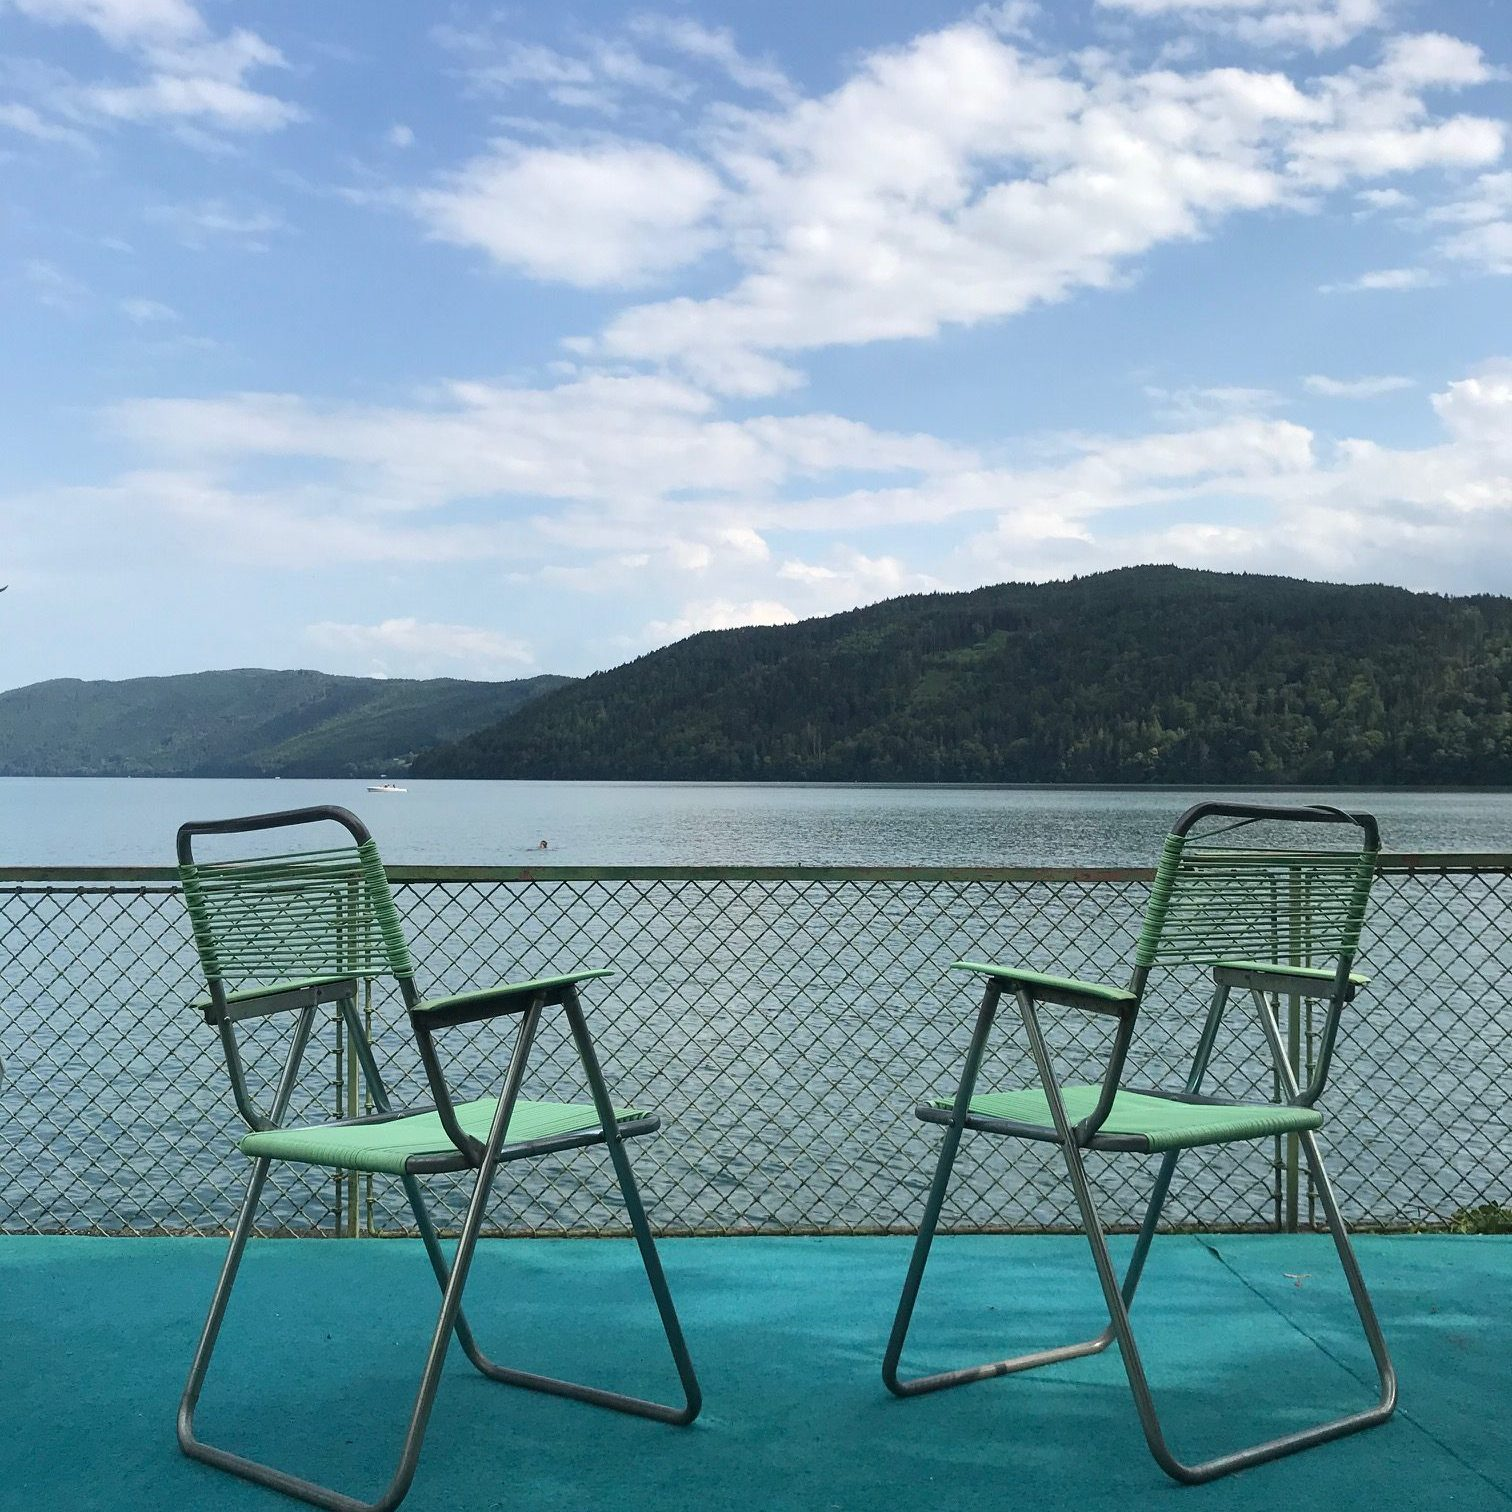 Zwei Stühle am Seeufer